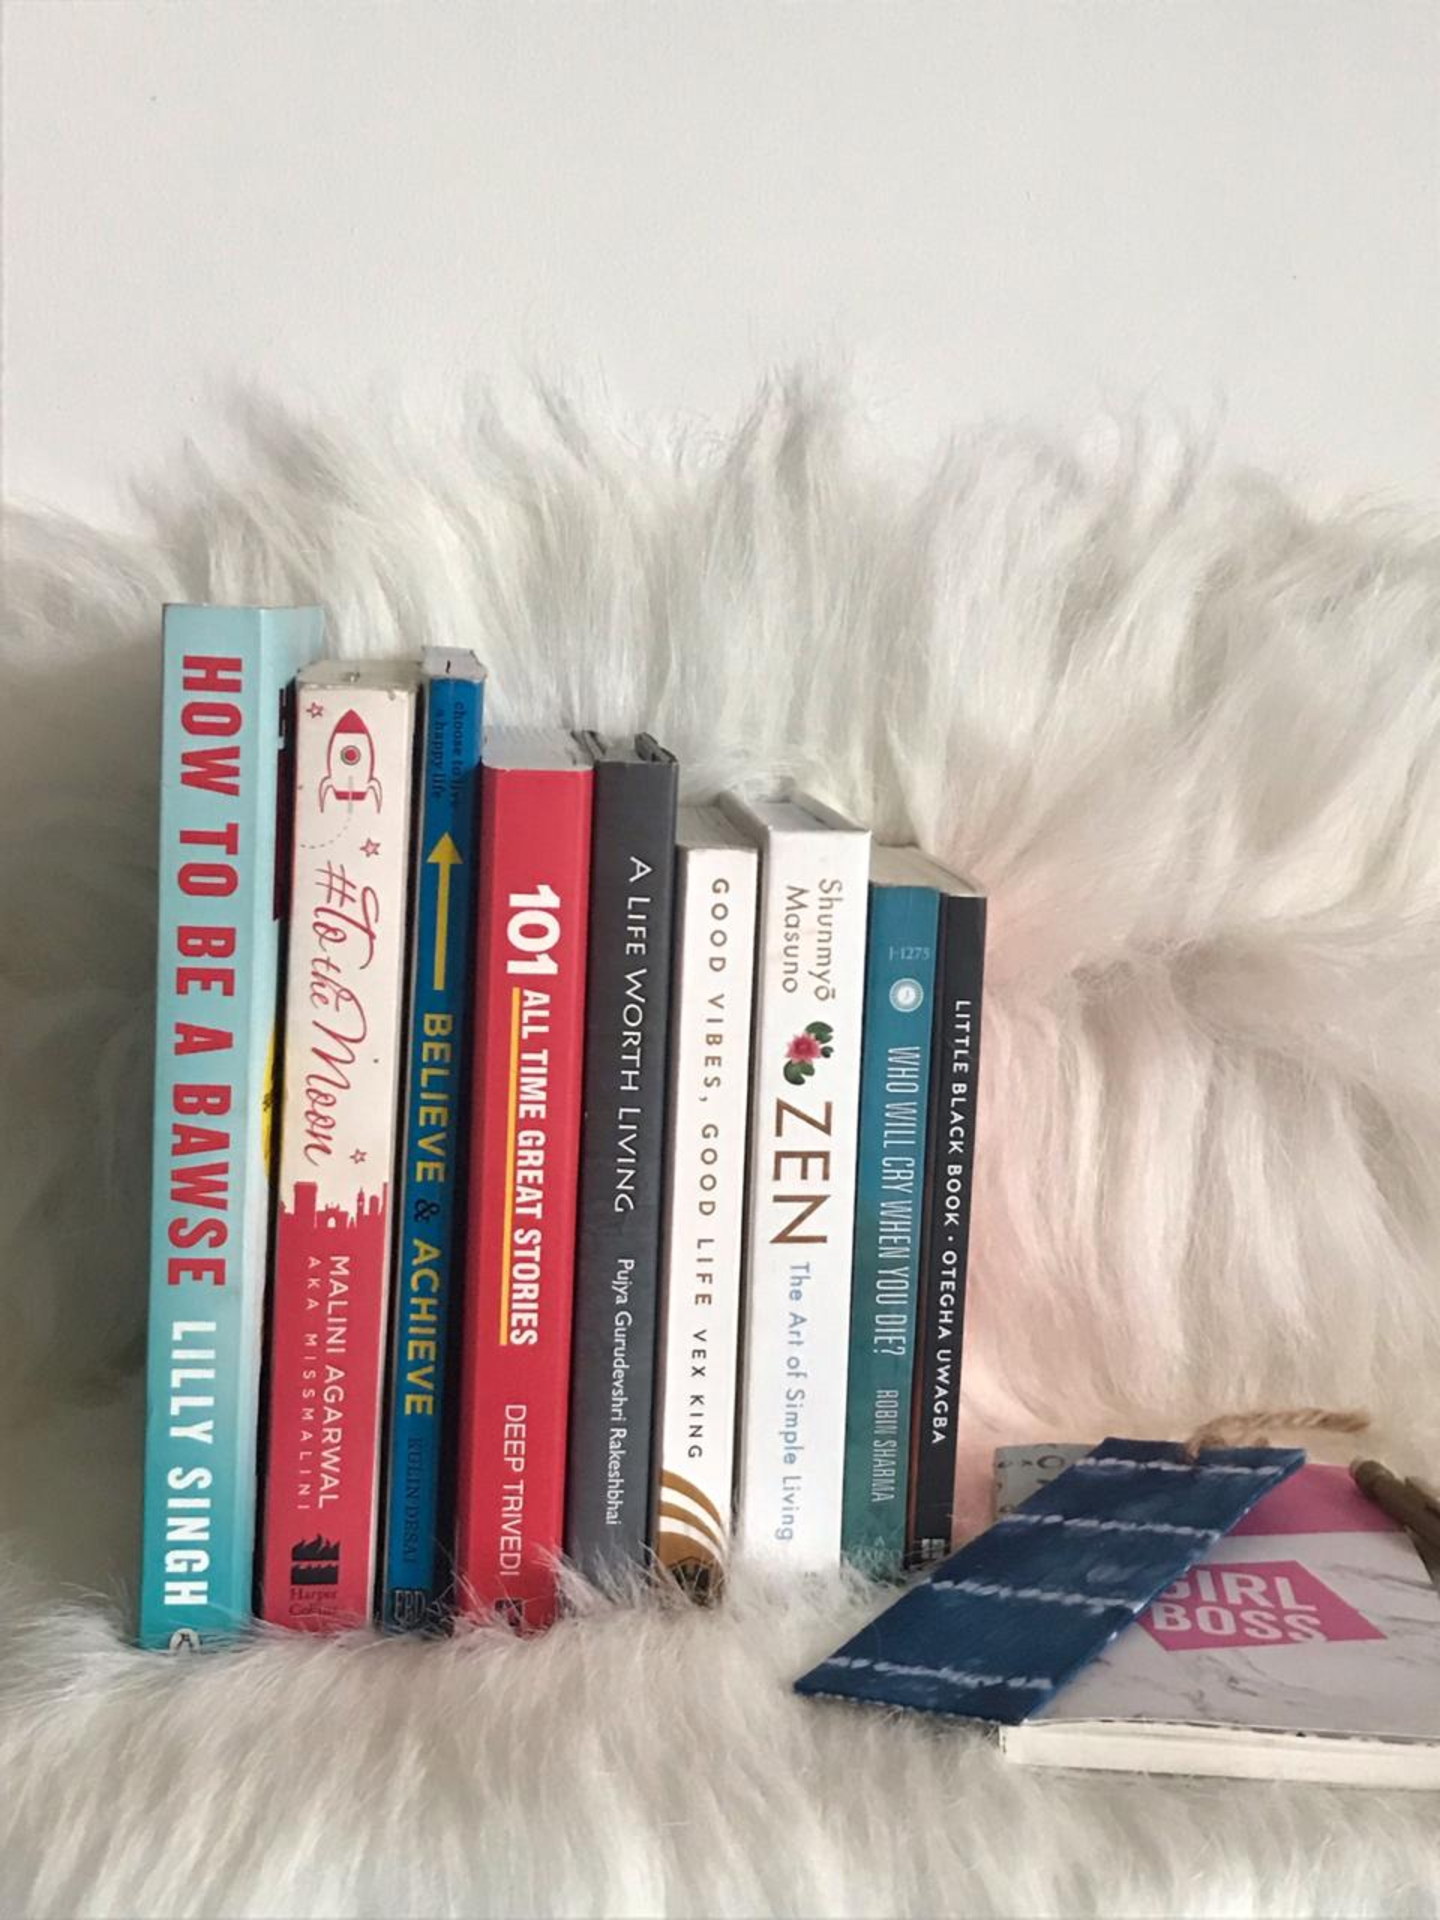 The Jessica Pancholi - Books